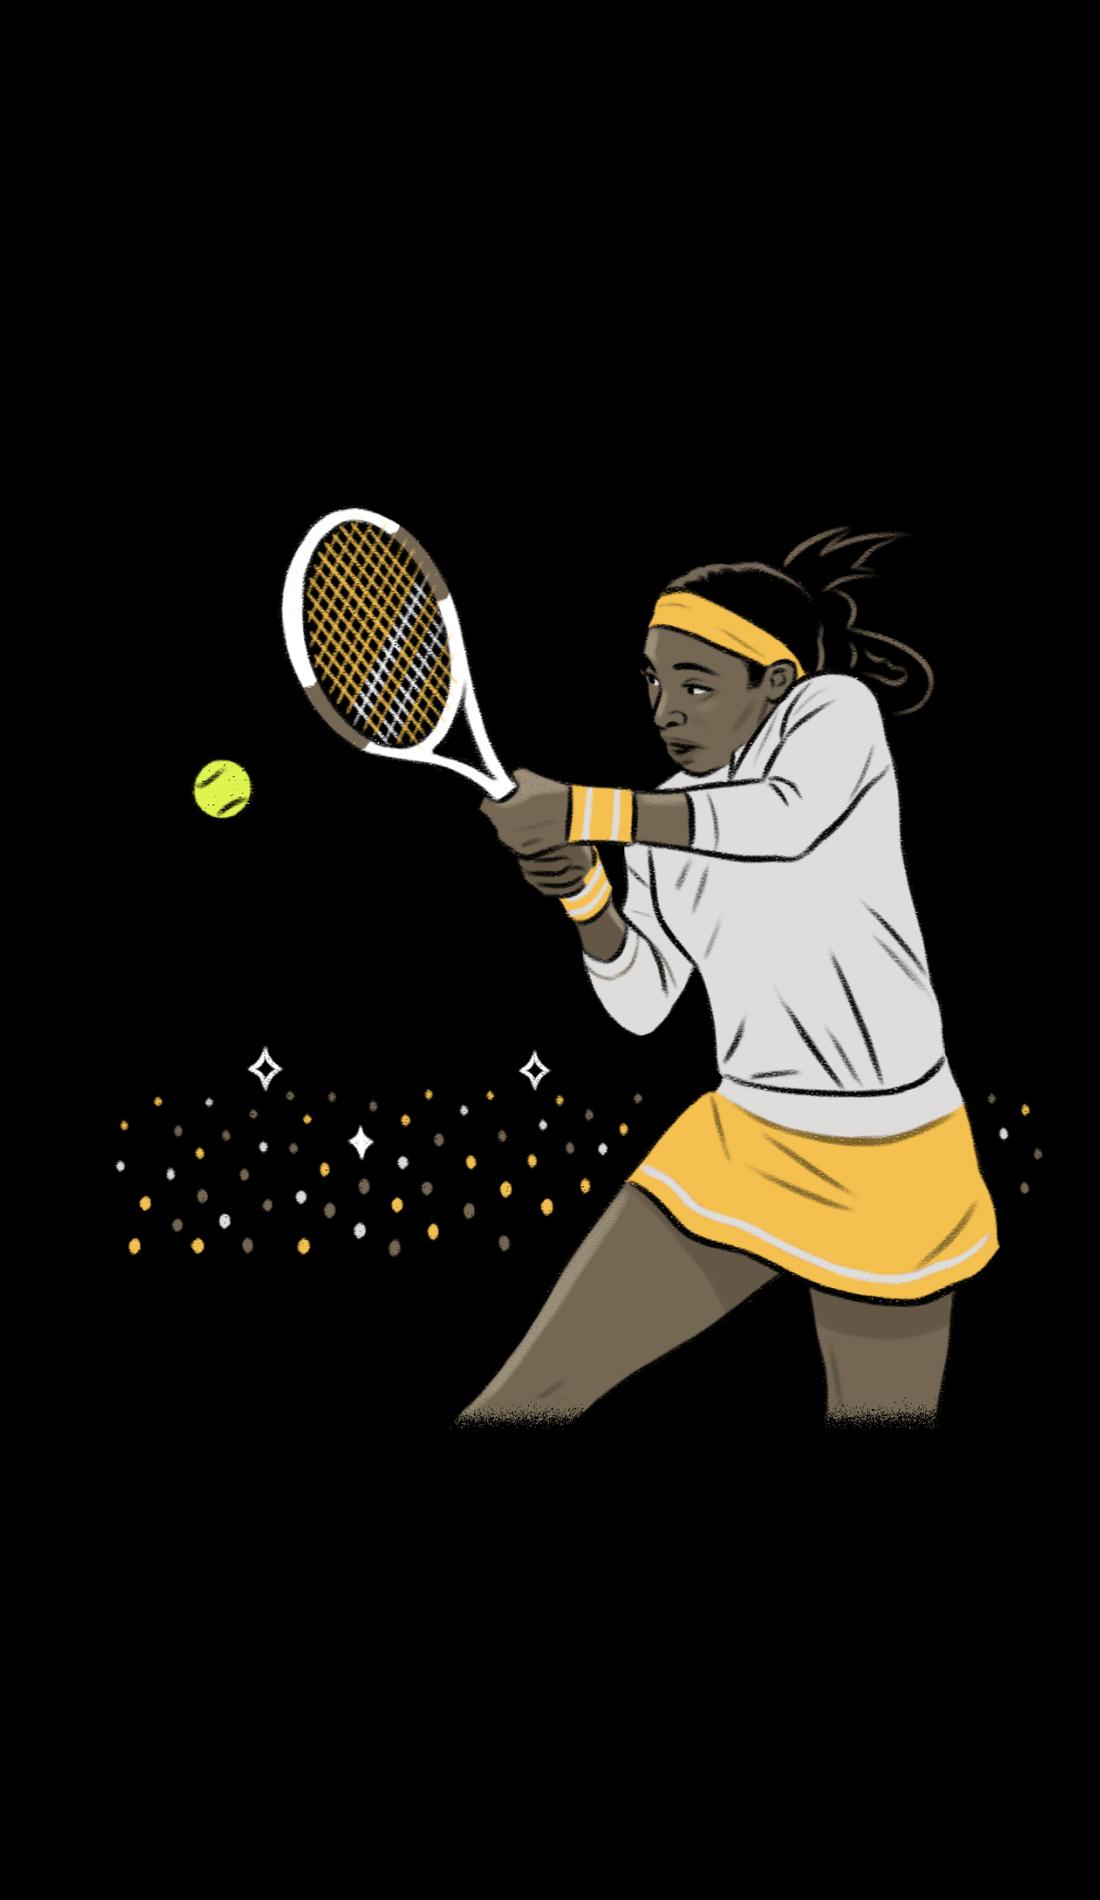 A LA Tennis Open live event